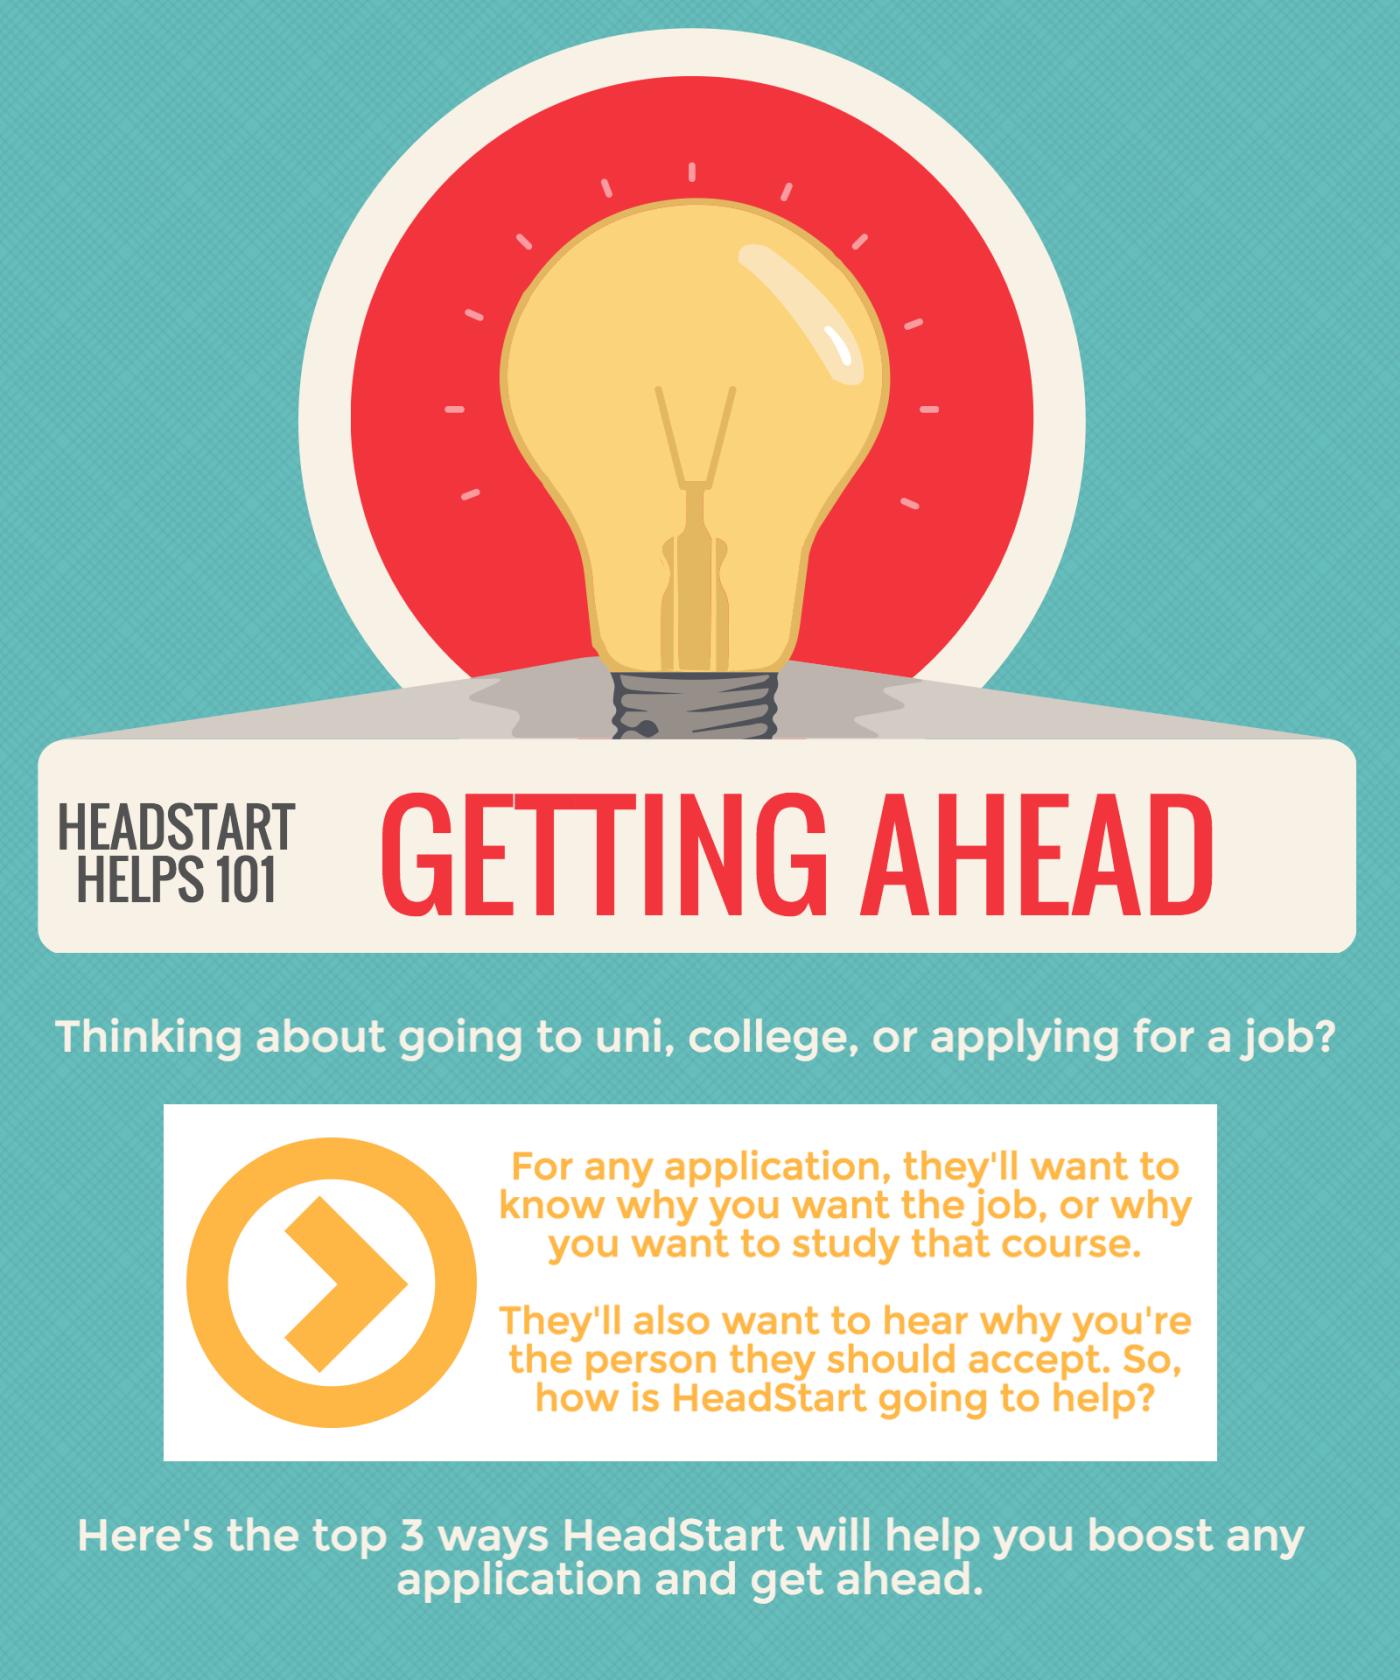 how does headstart help uni or job applications headstart how does headstart help uni or job applications